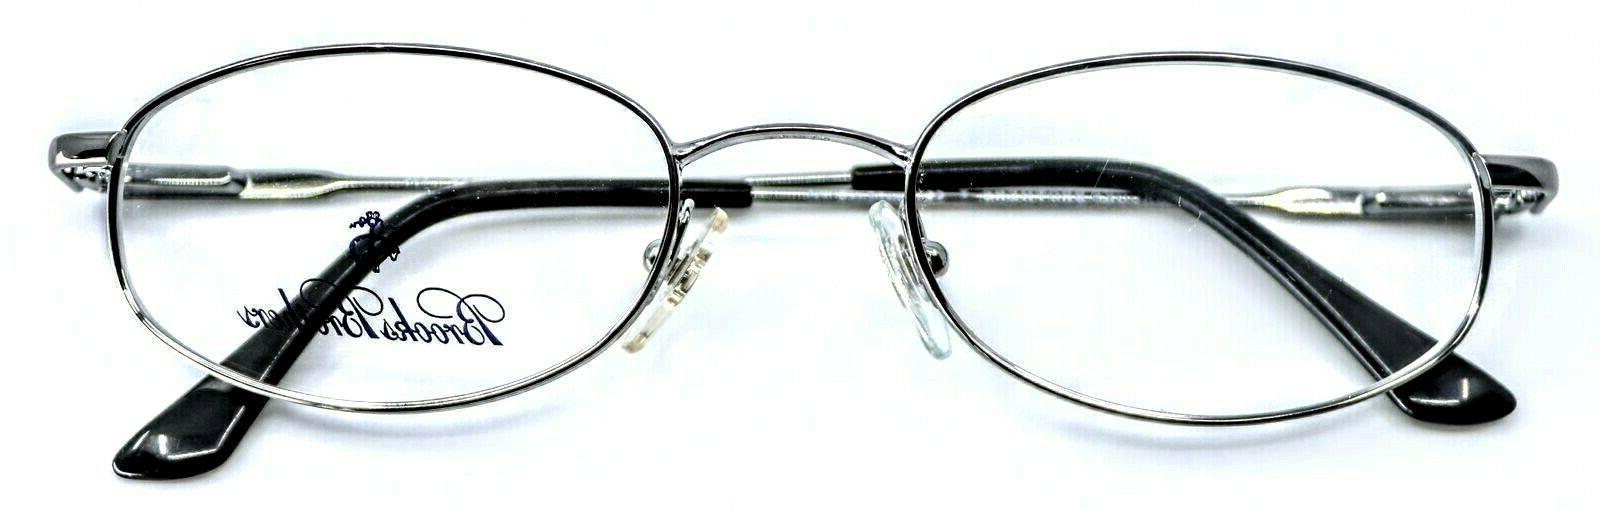 BROOKS BROTHERS Gunmetal Eyeglass Frames 49-19-135